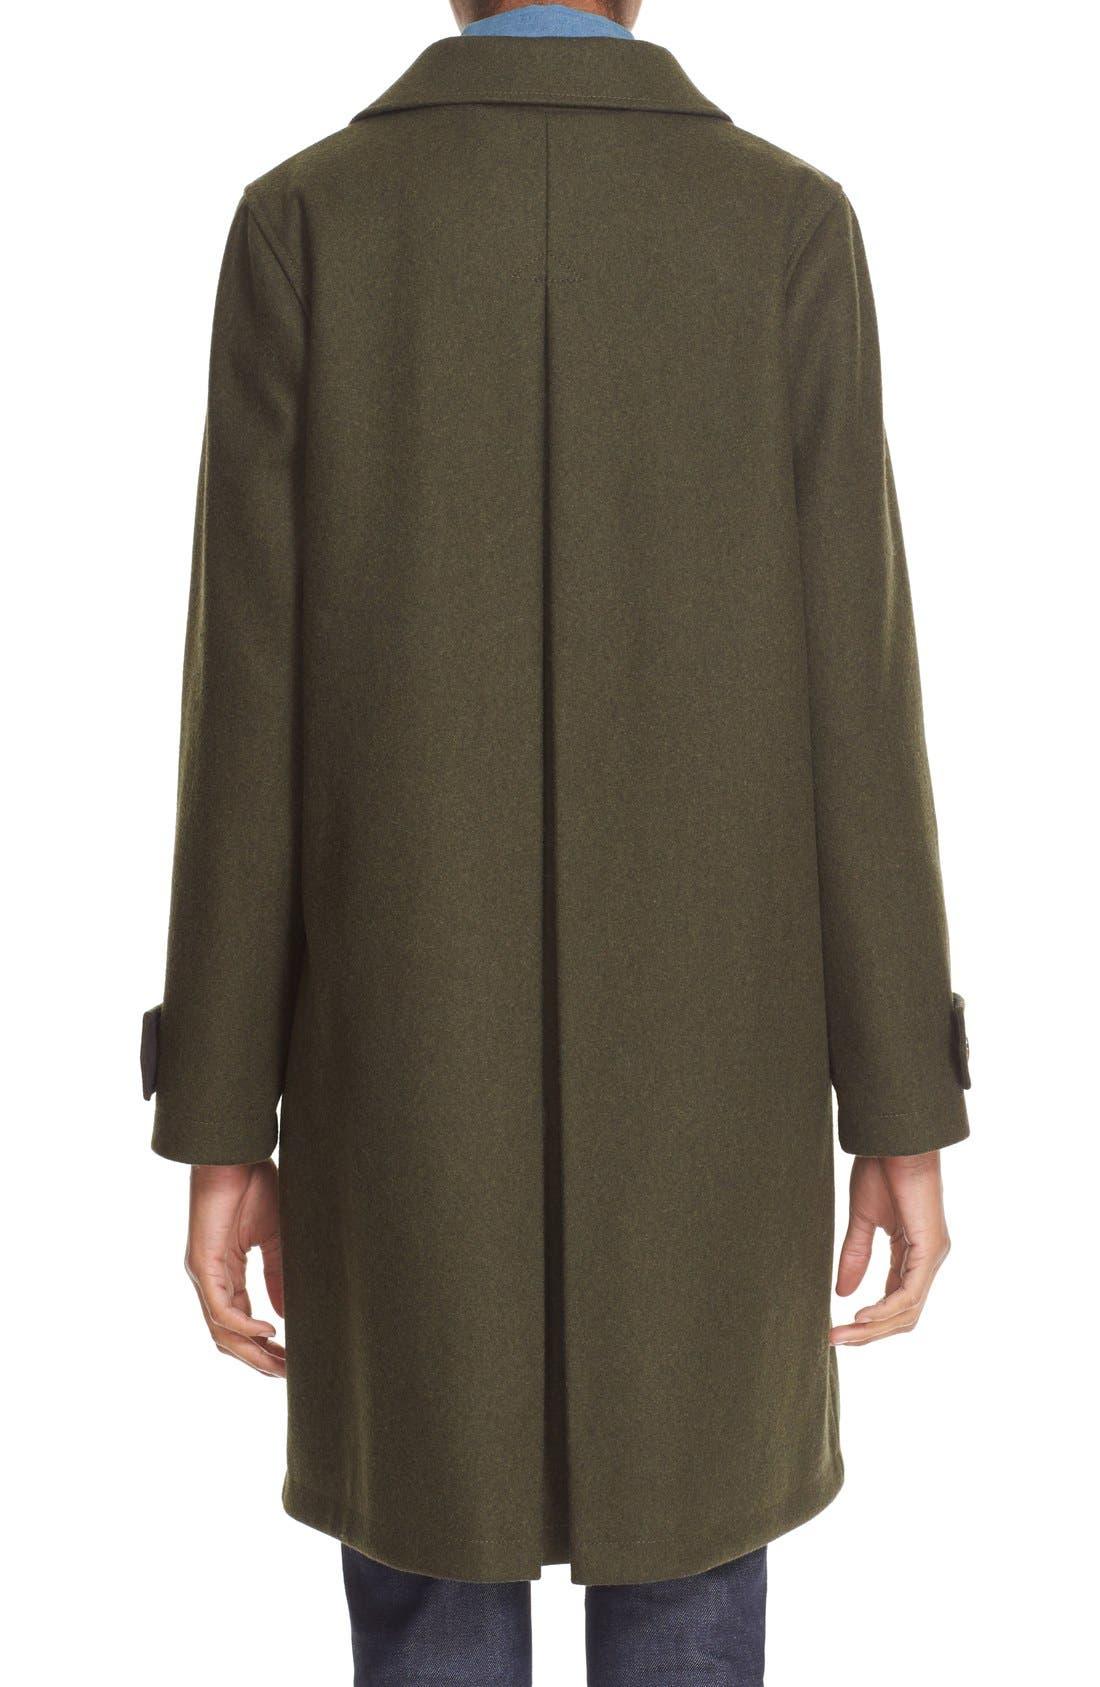 'Dinard' Wool Blend Mac Coat,                             Alternate thumbnail 2, color,                             300